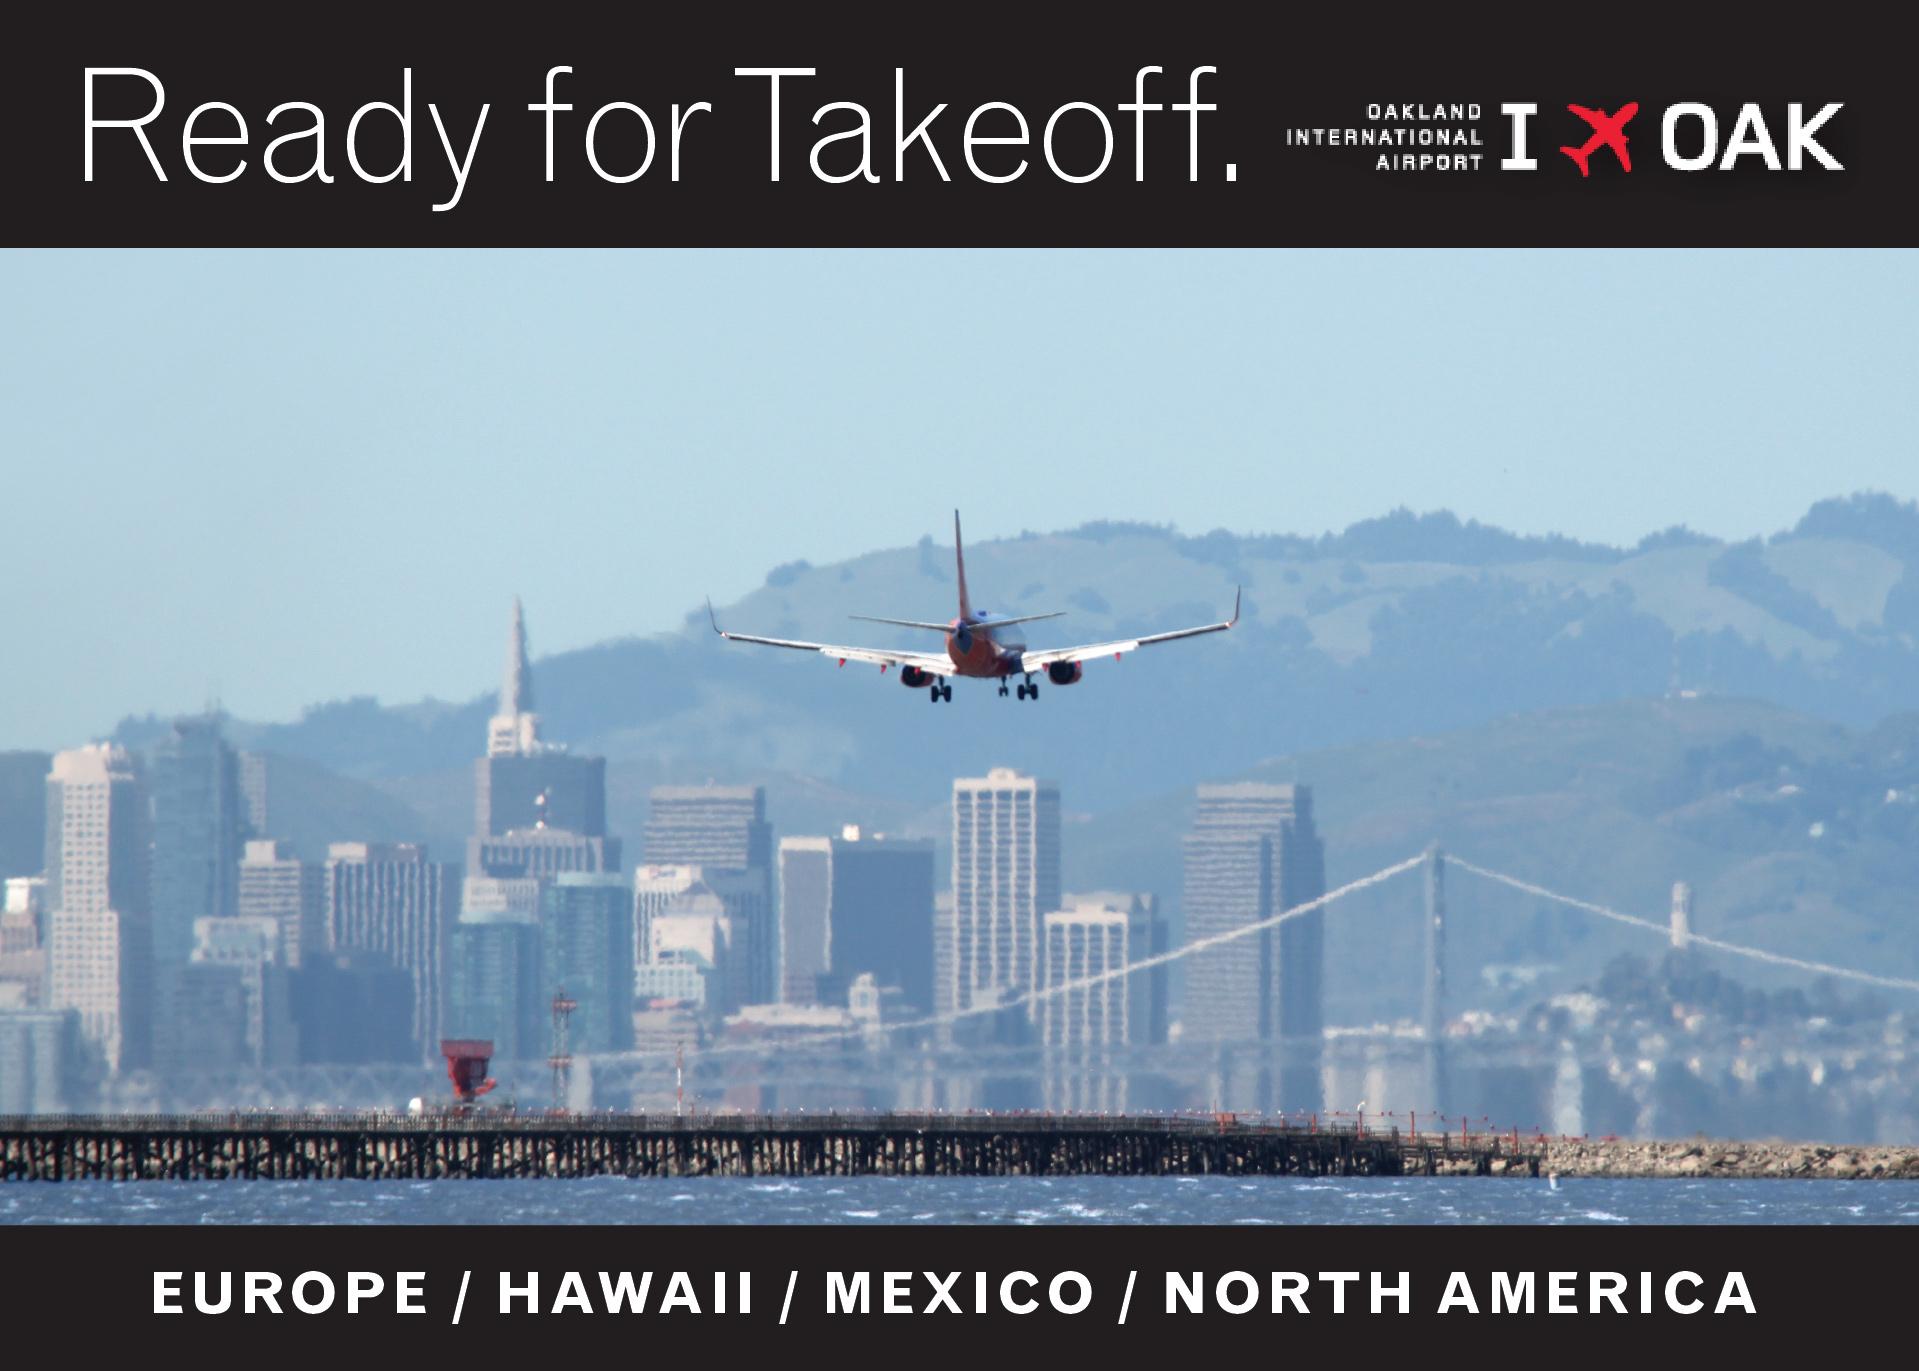 Ready for Takeoff - I Fly OAK